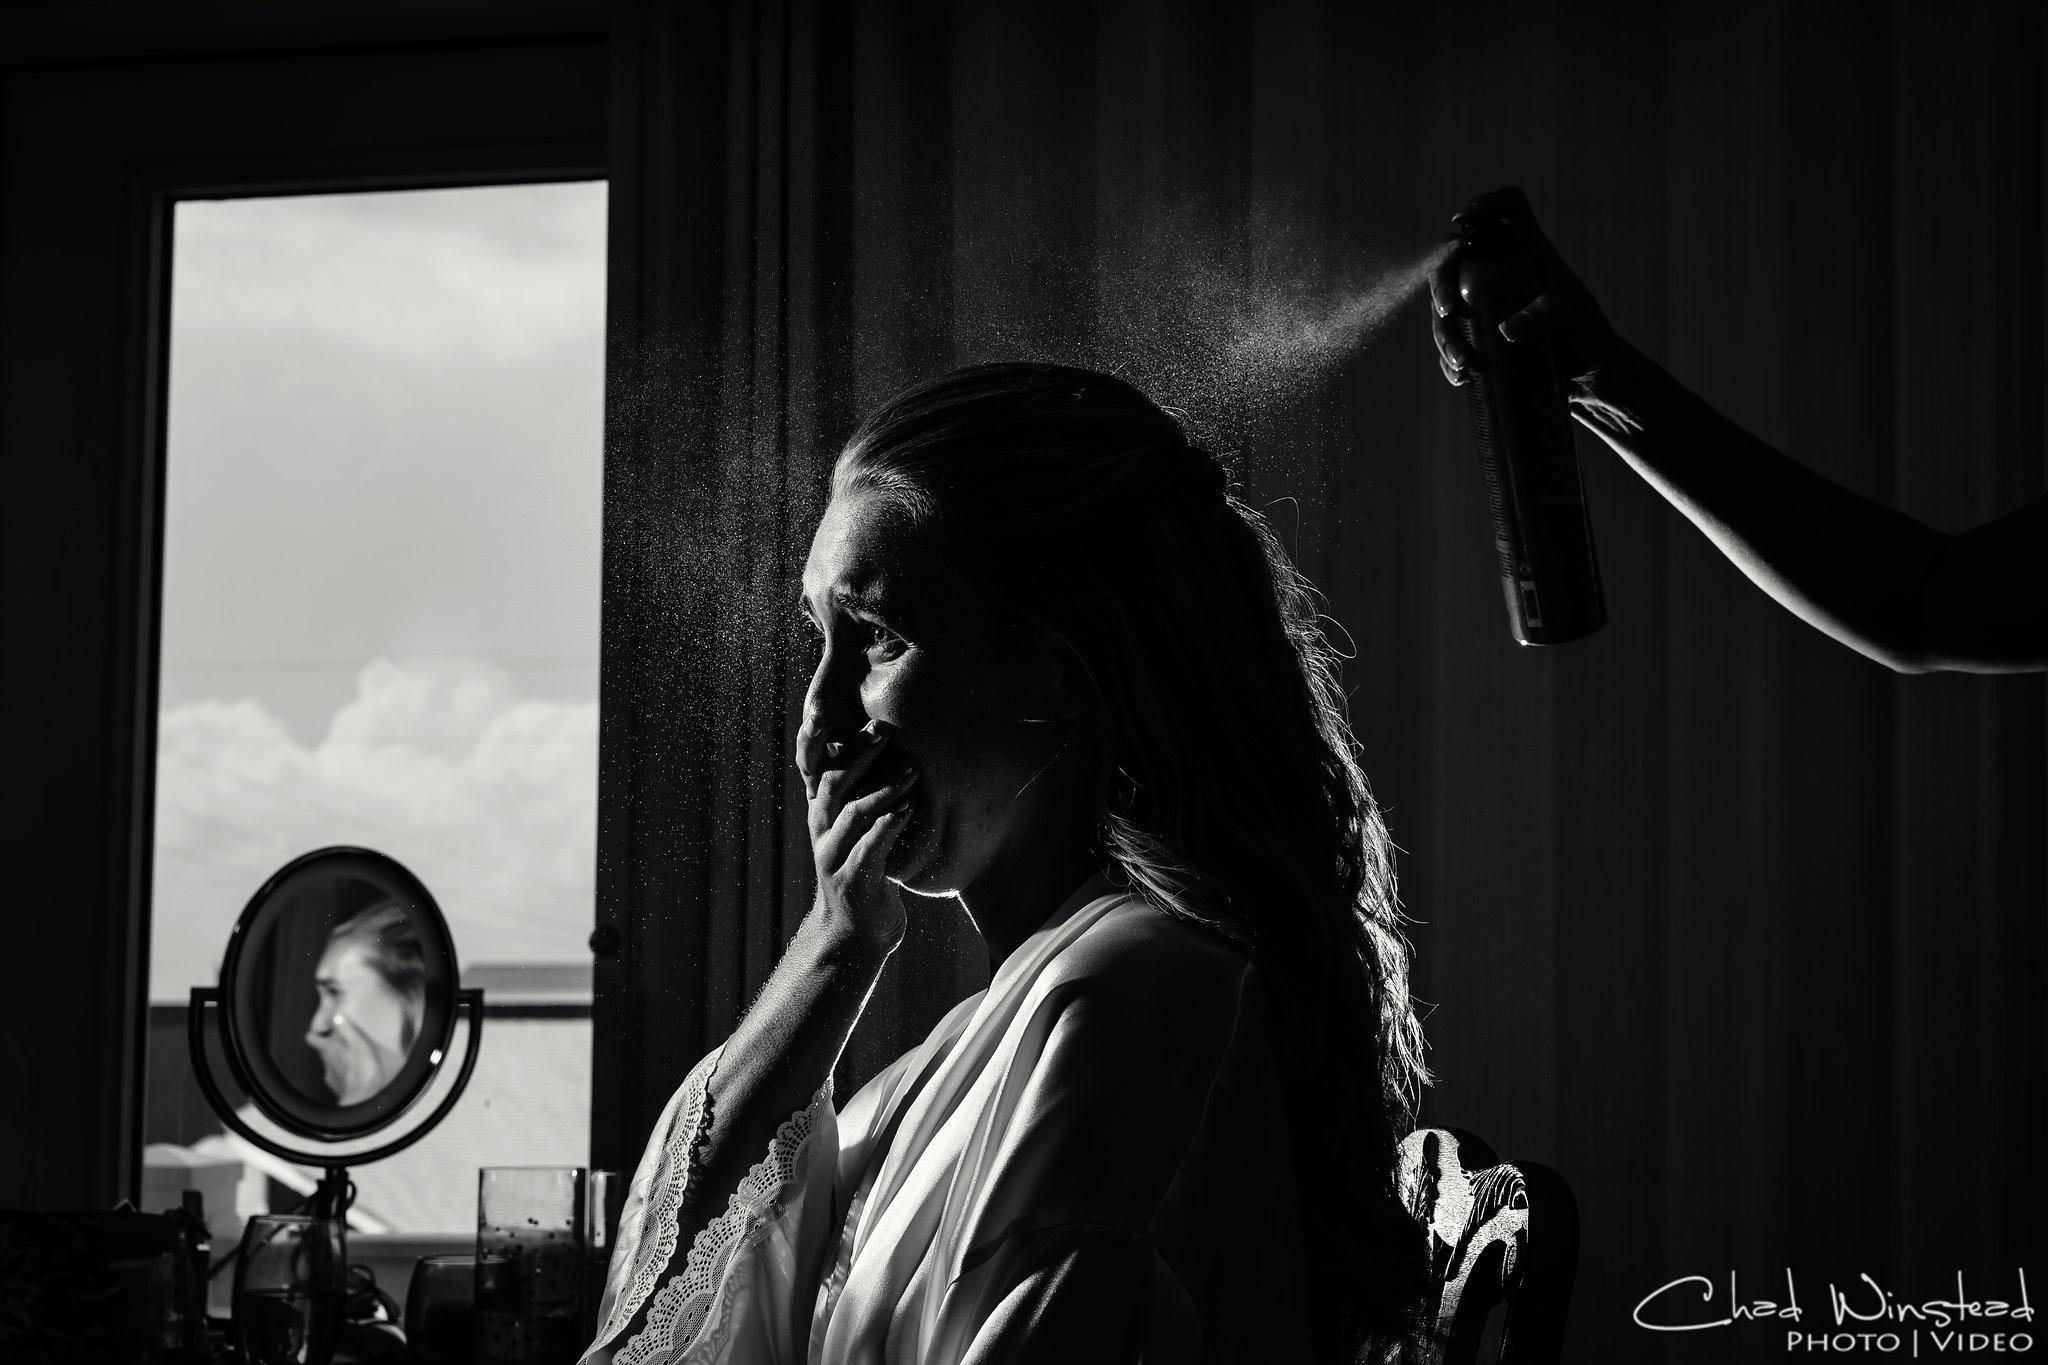 creative-bride-getting-ready-photo.jpg